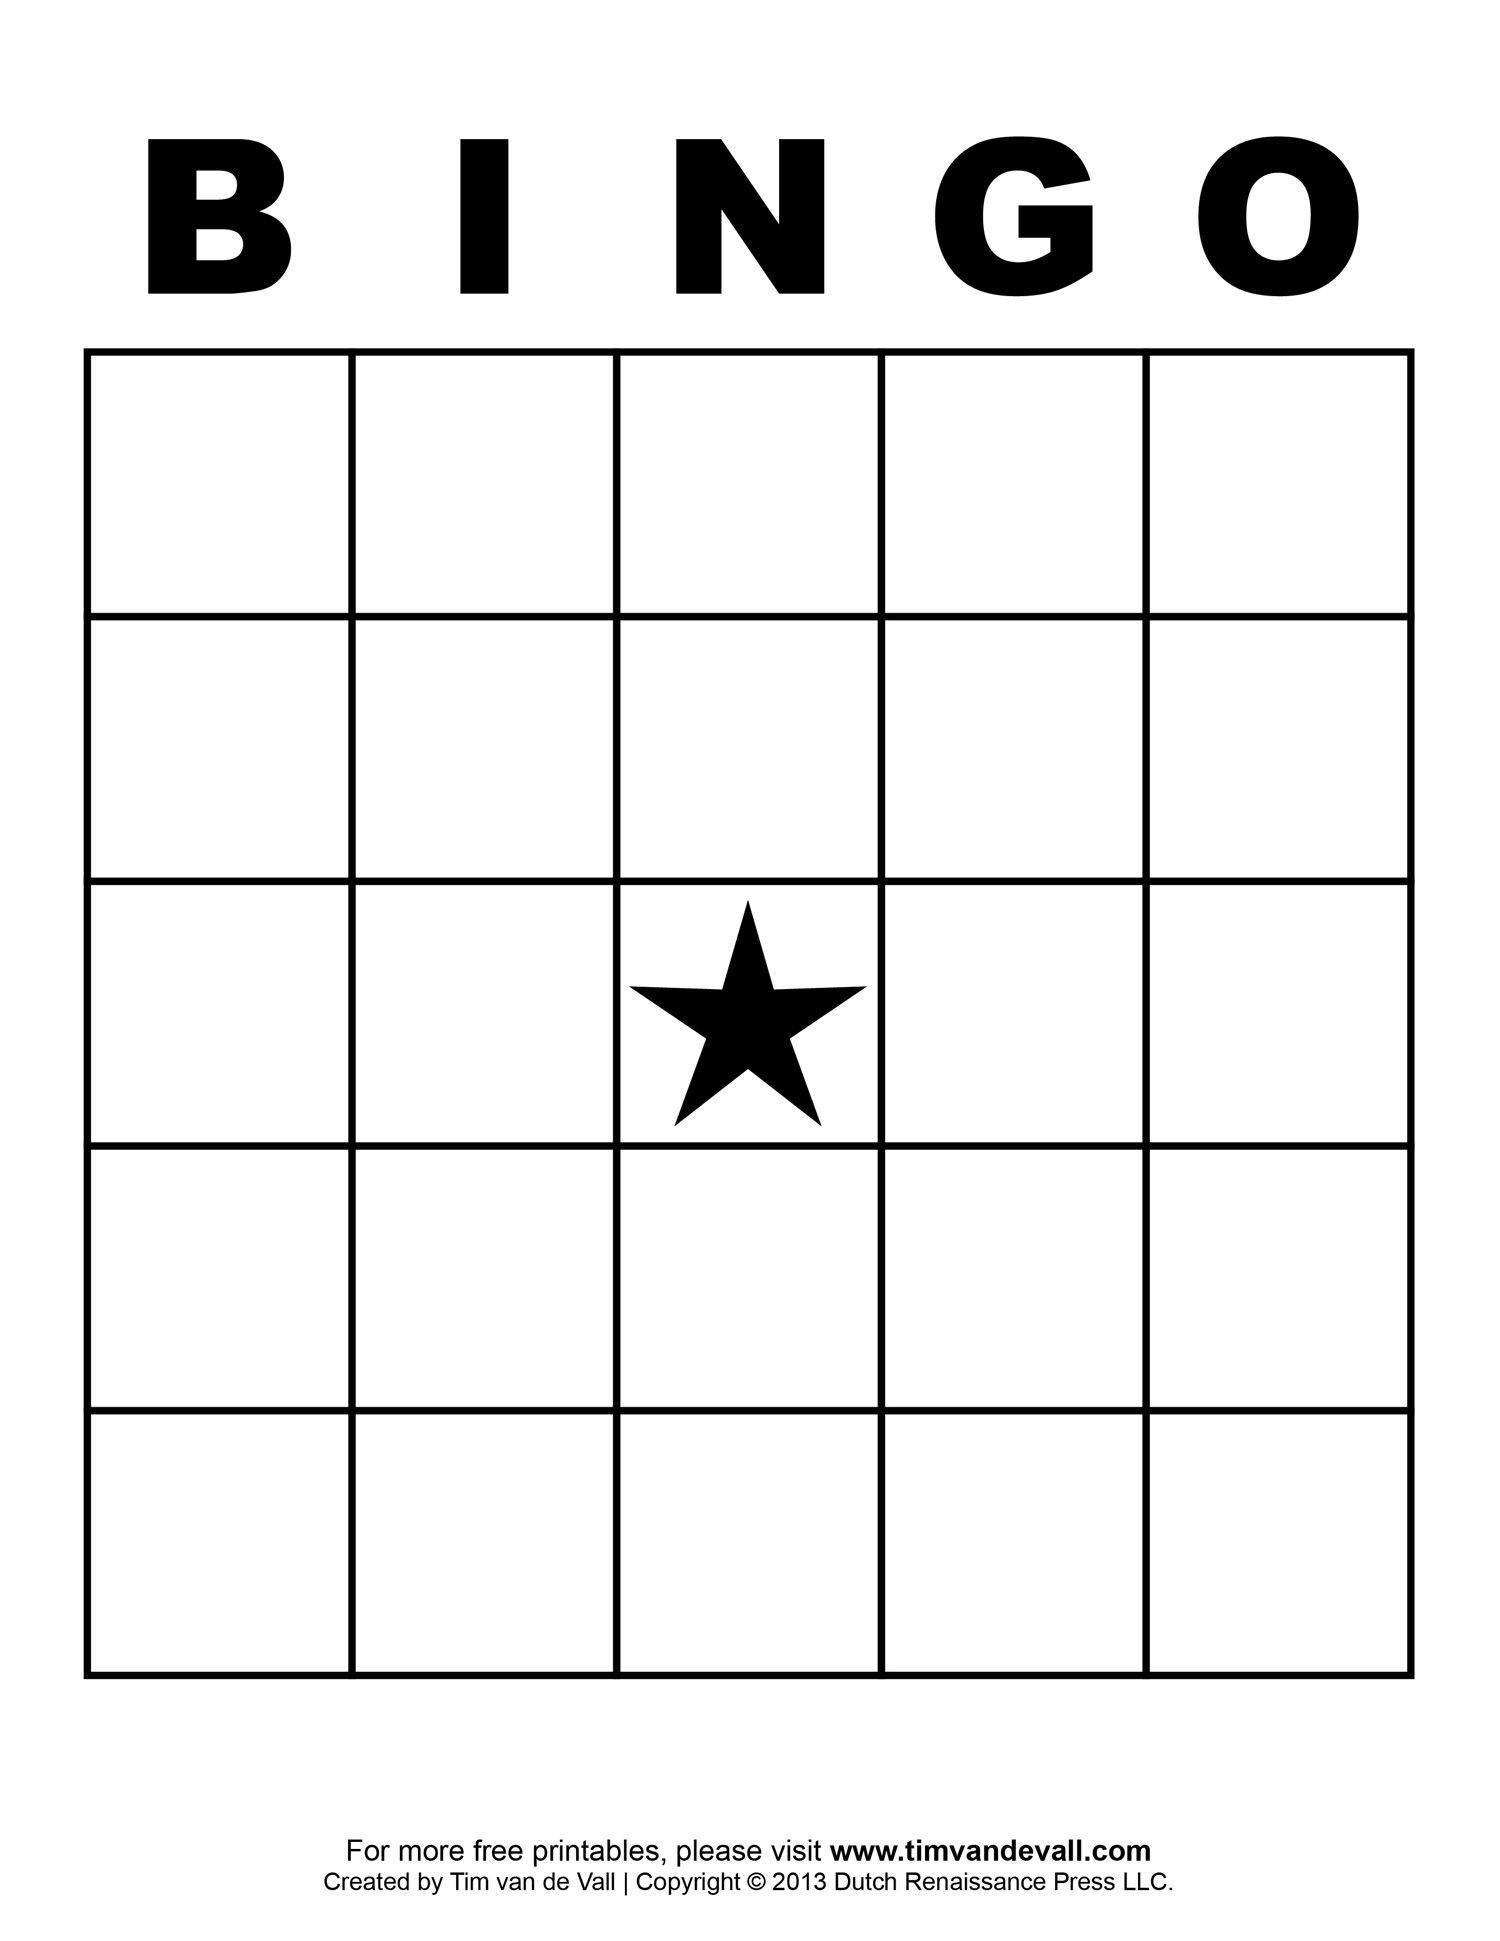 Free Printable Blank Bingo Cards Template 4 X 4   Classroom   Blank - Free Printable Blank Bingo Cards